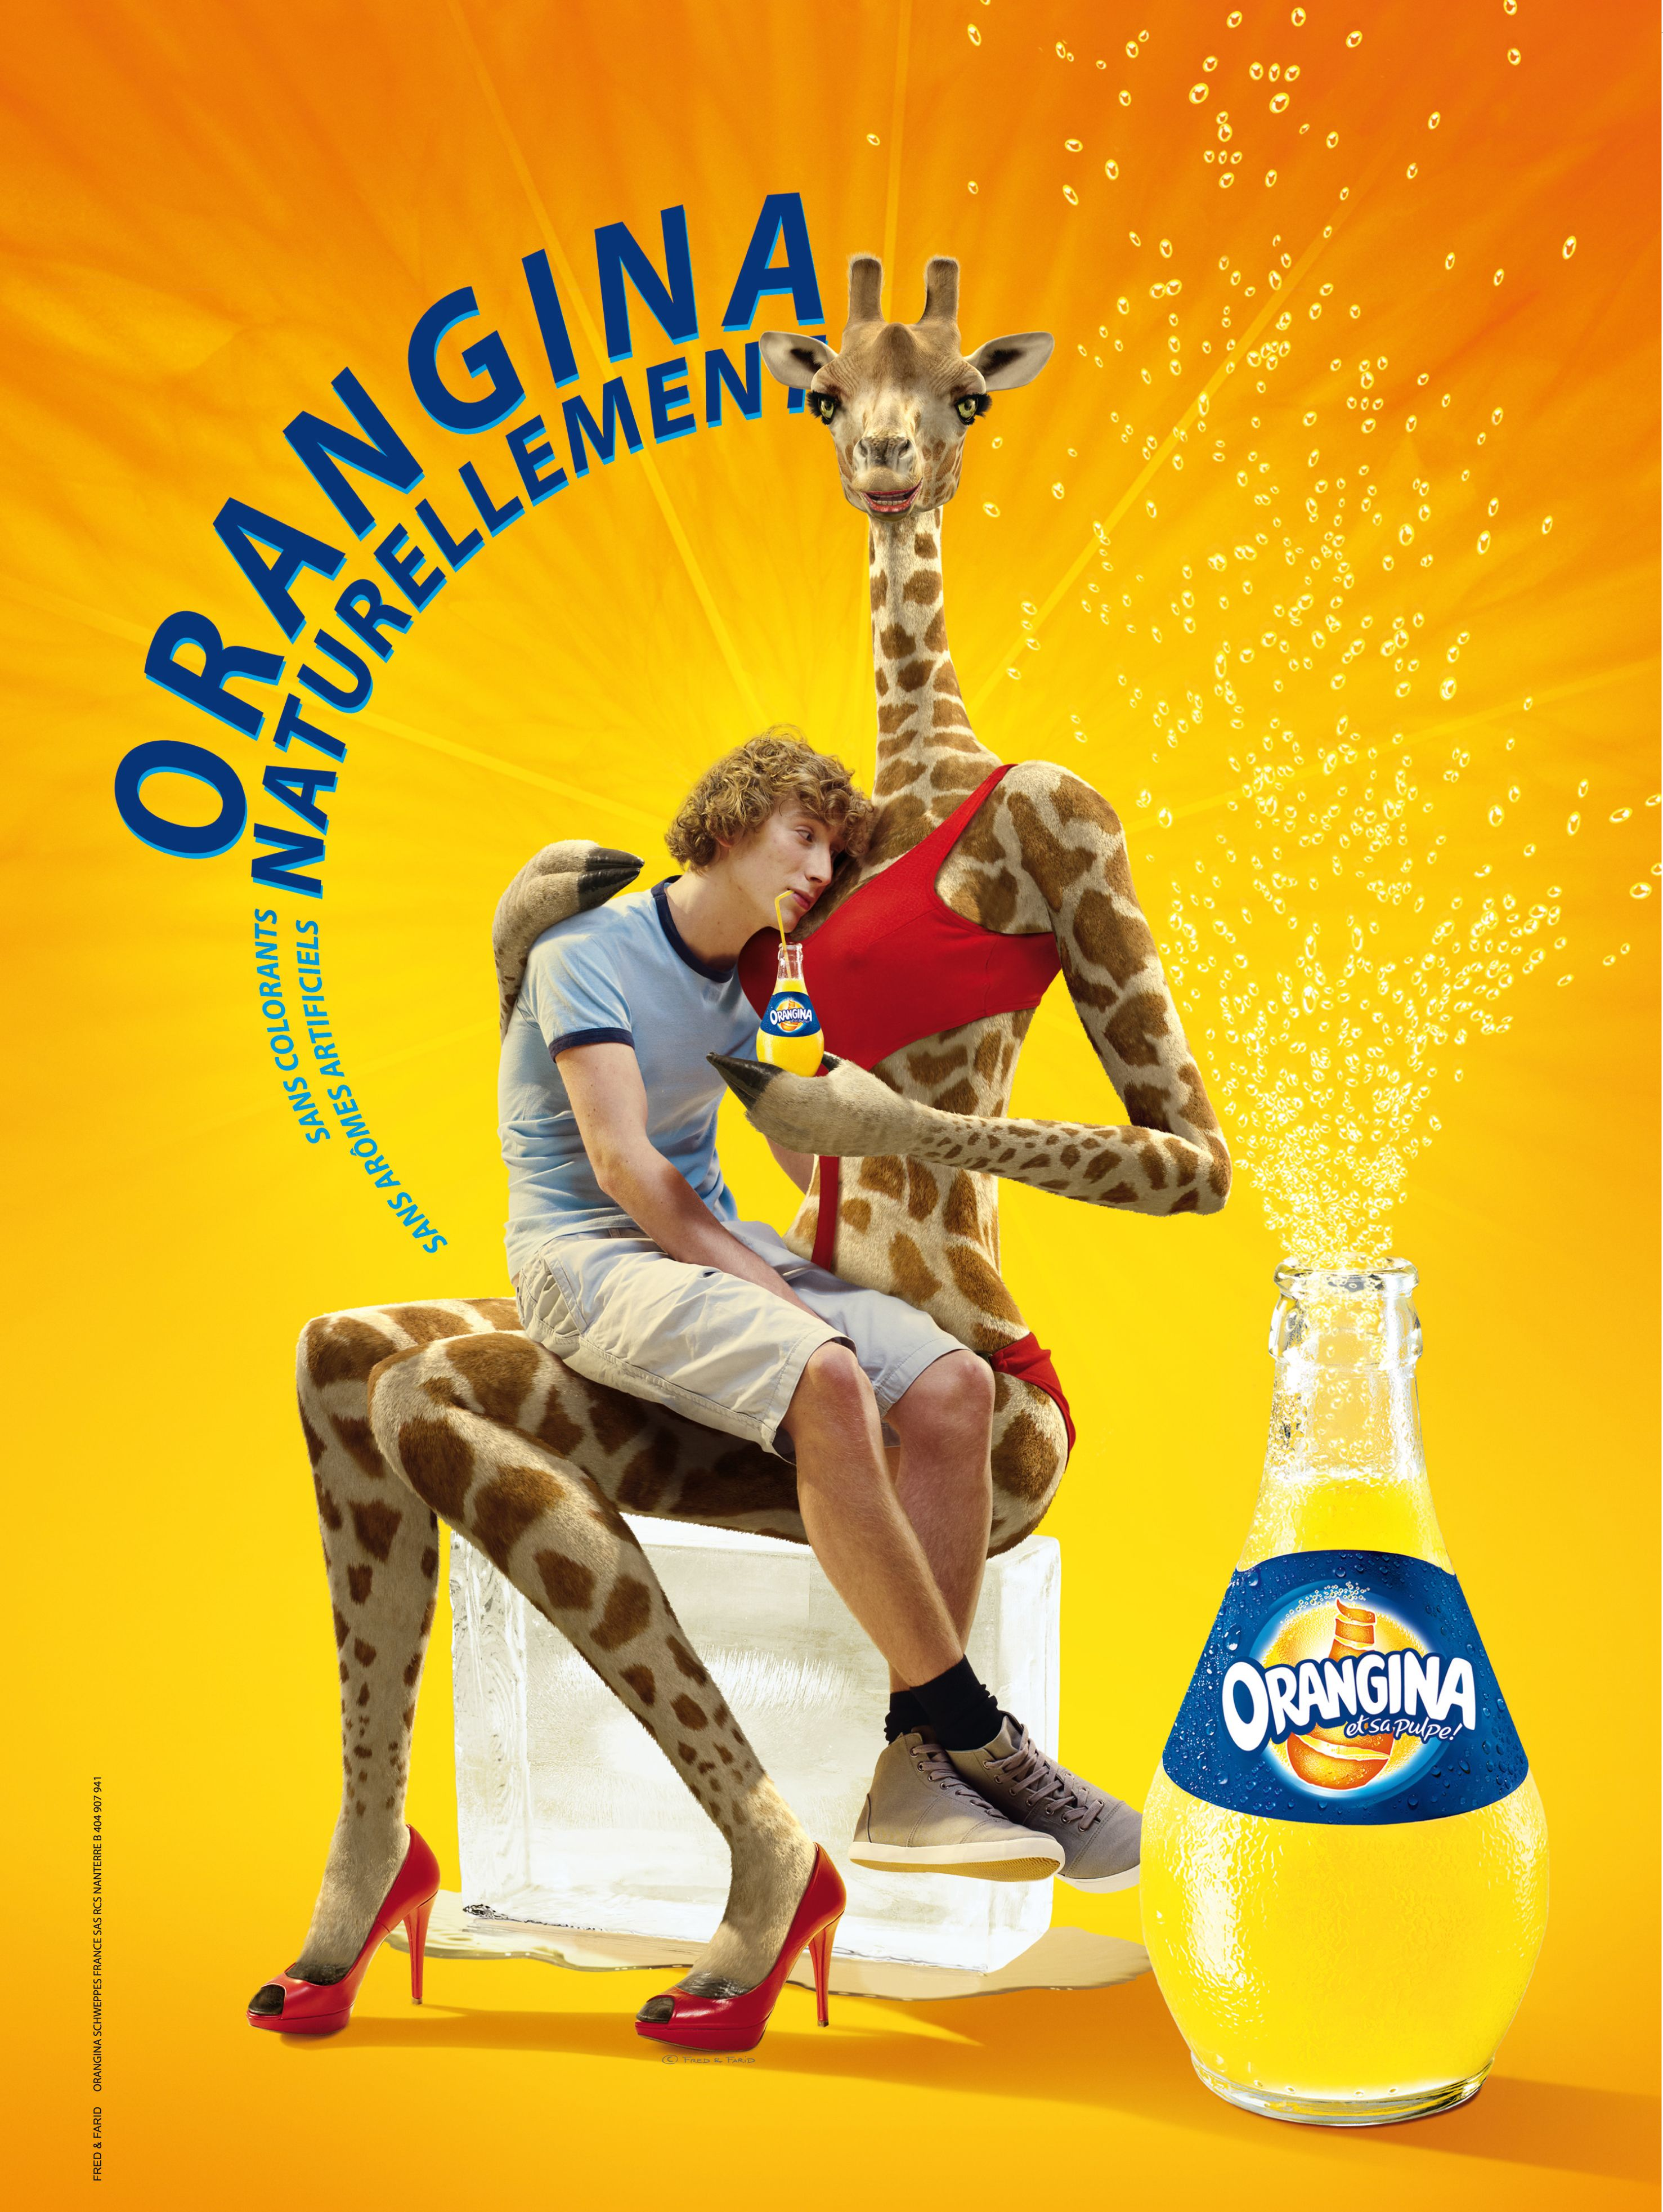 French Advert Sign Orangina Orange Drink